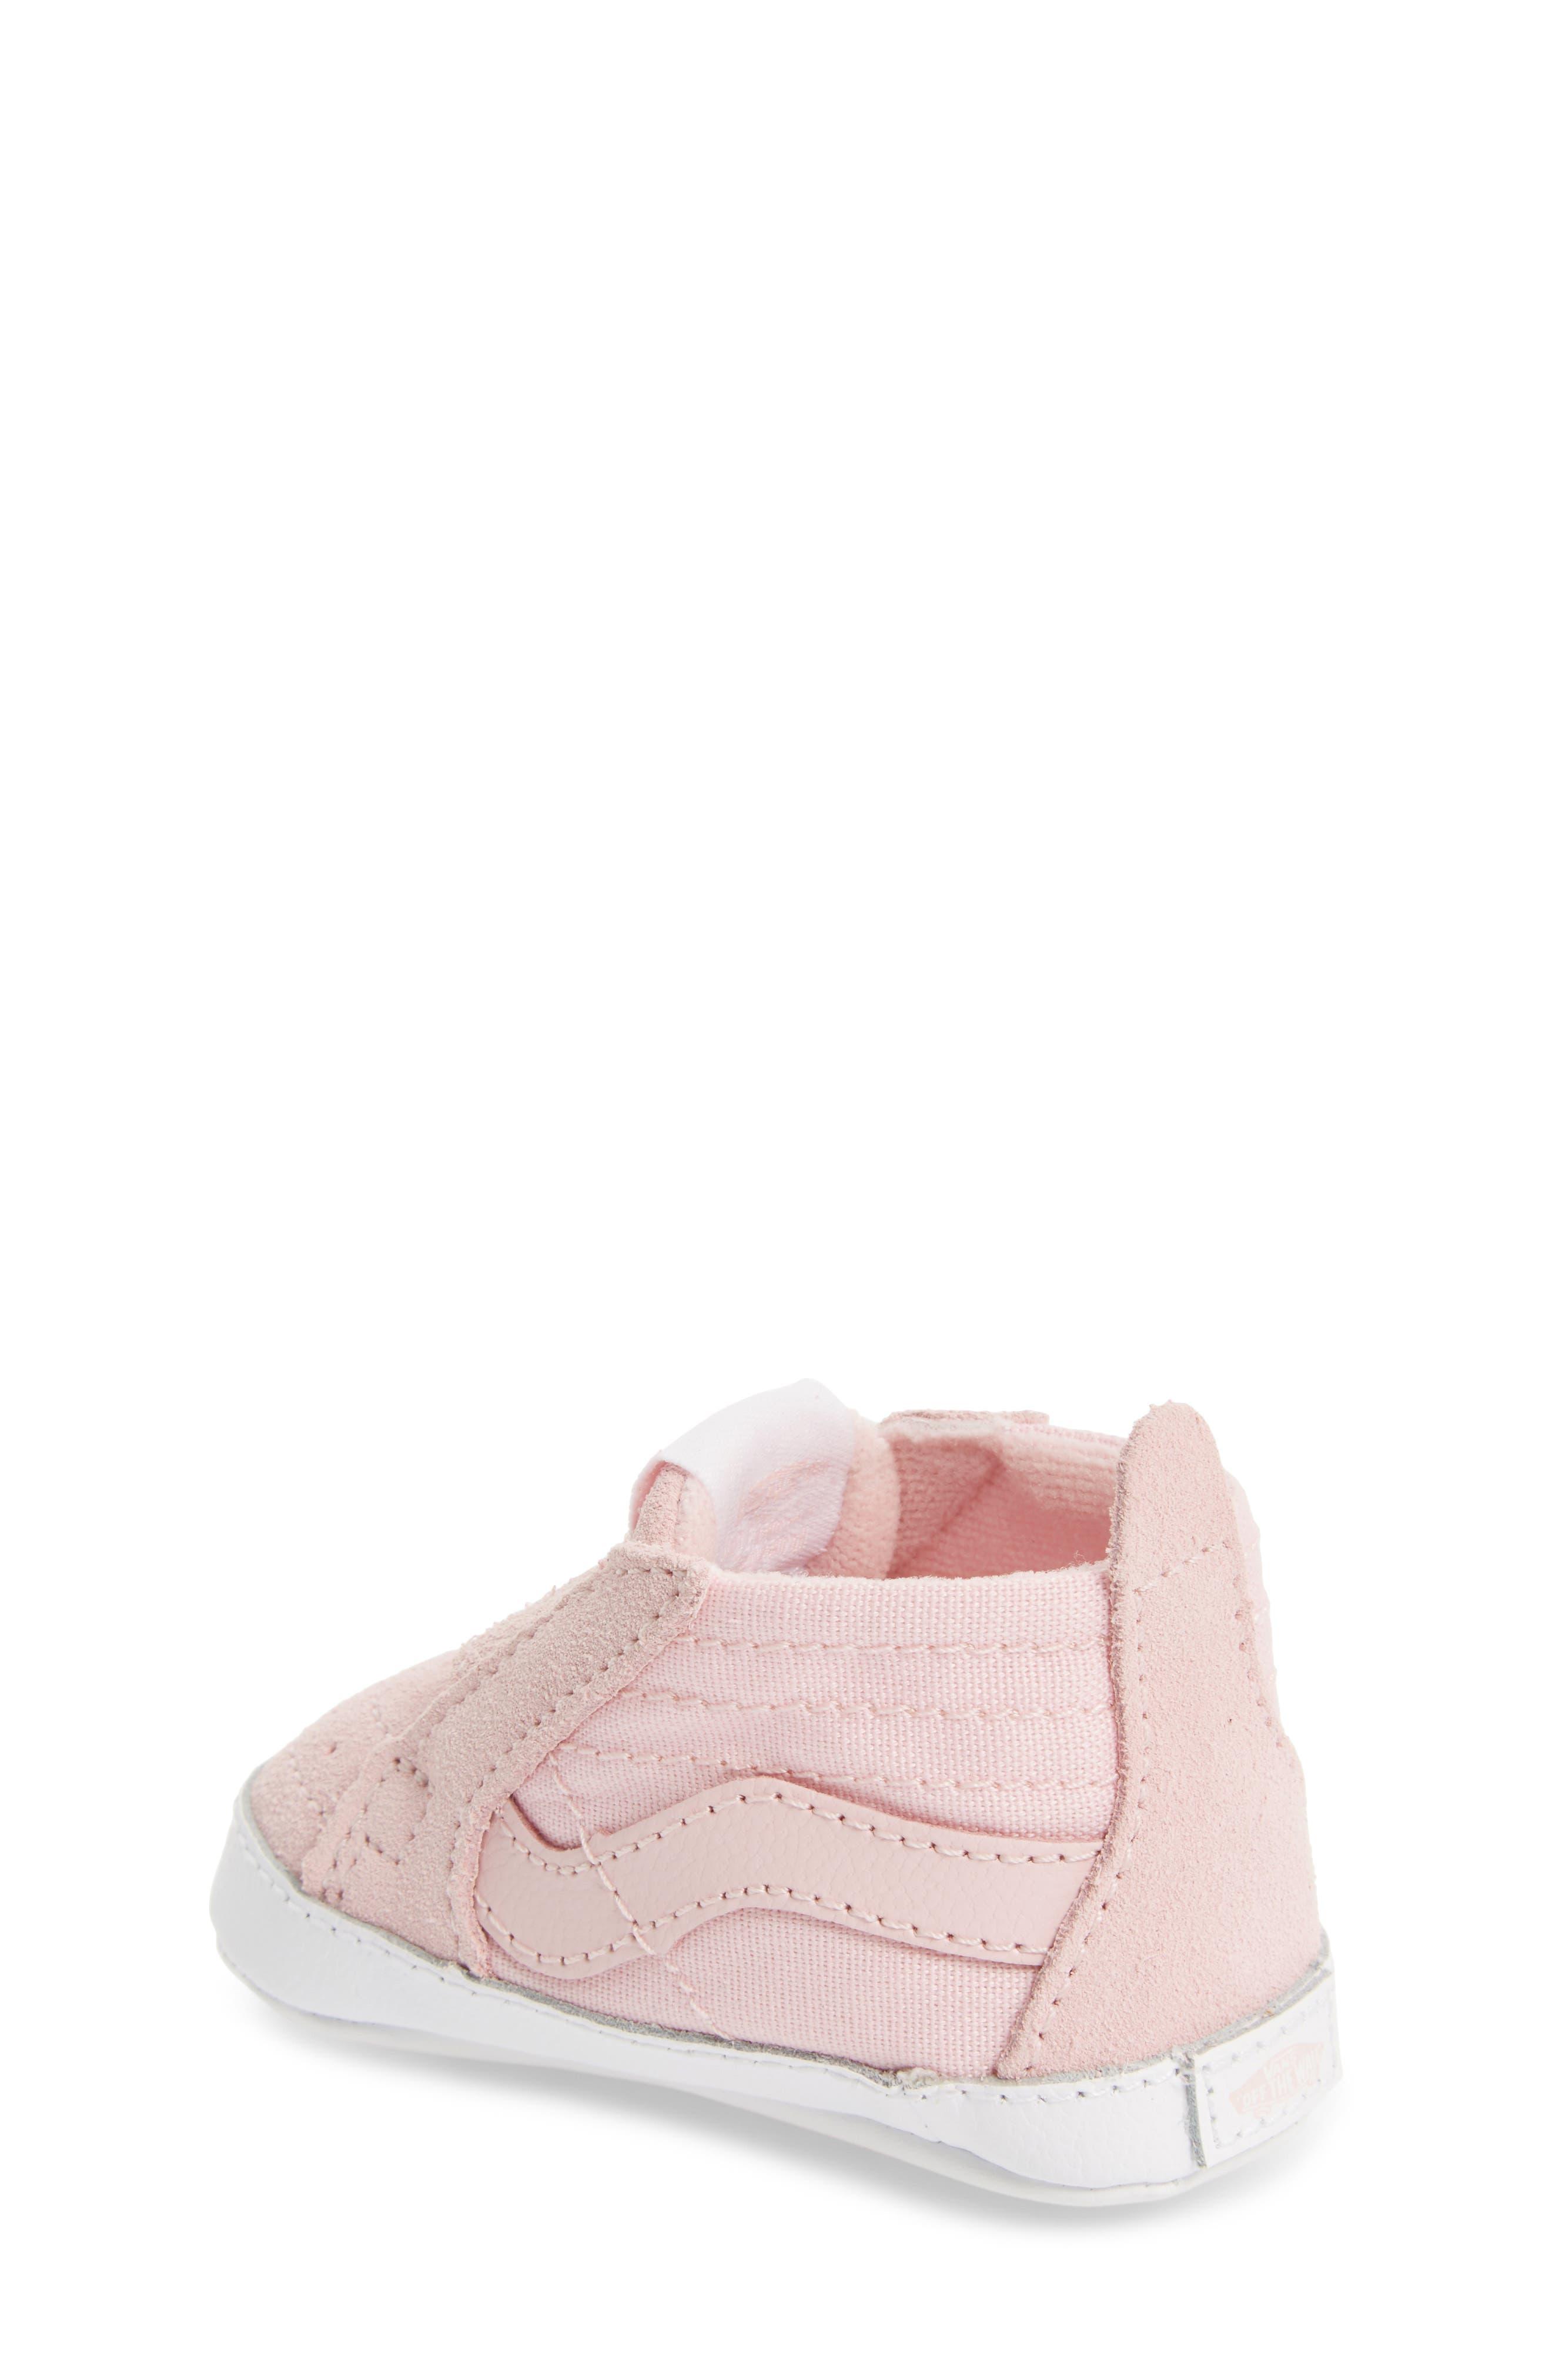 SK8-Hi Crib Sneaker,                             Alternate thumbnail 2, color,